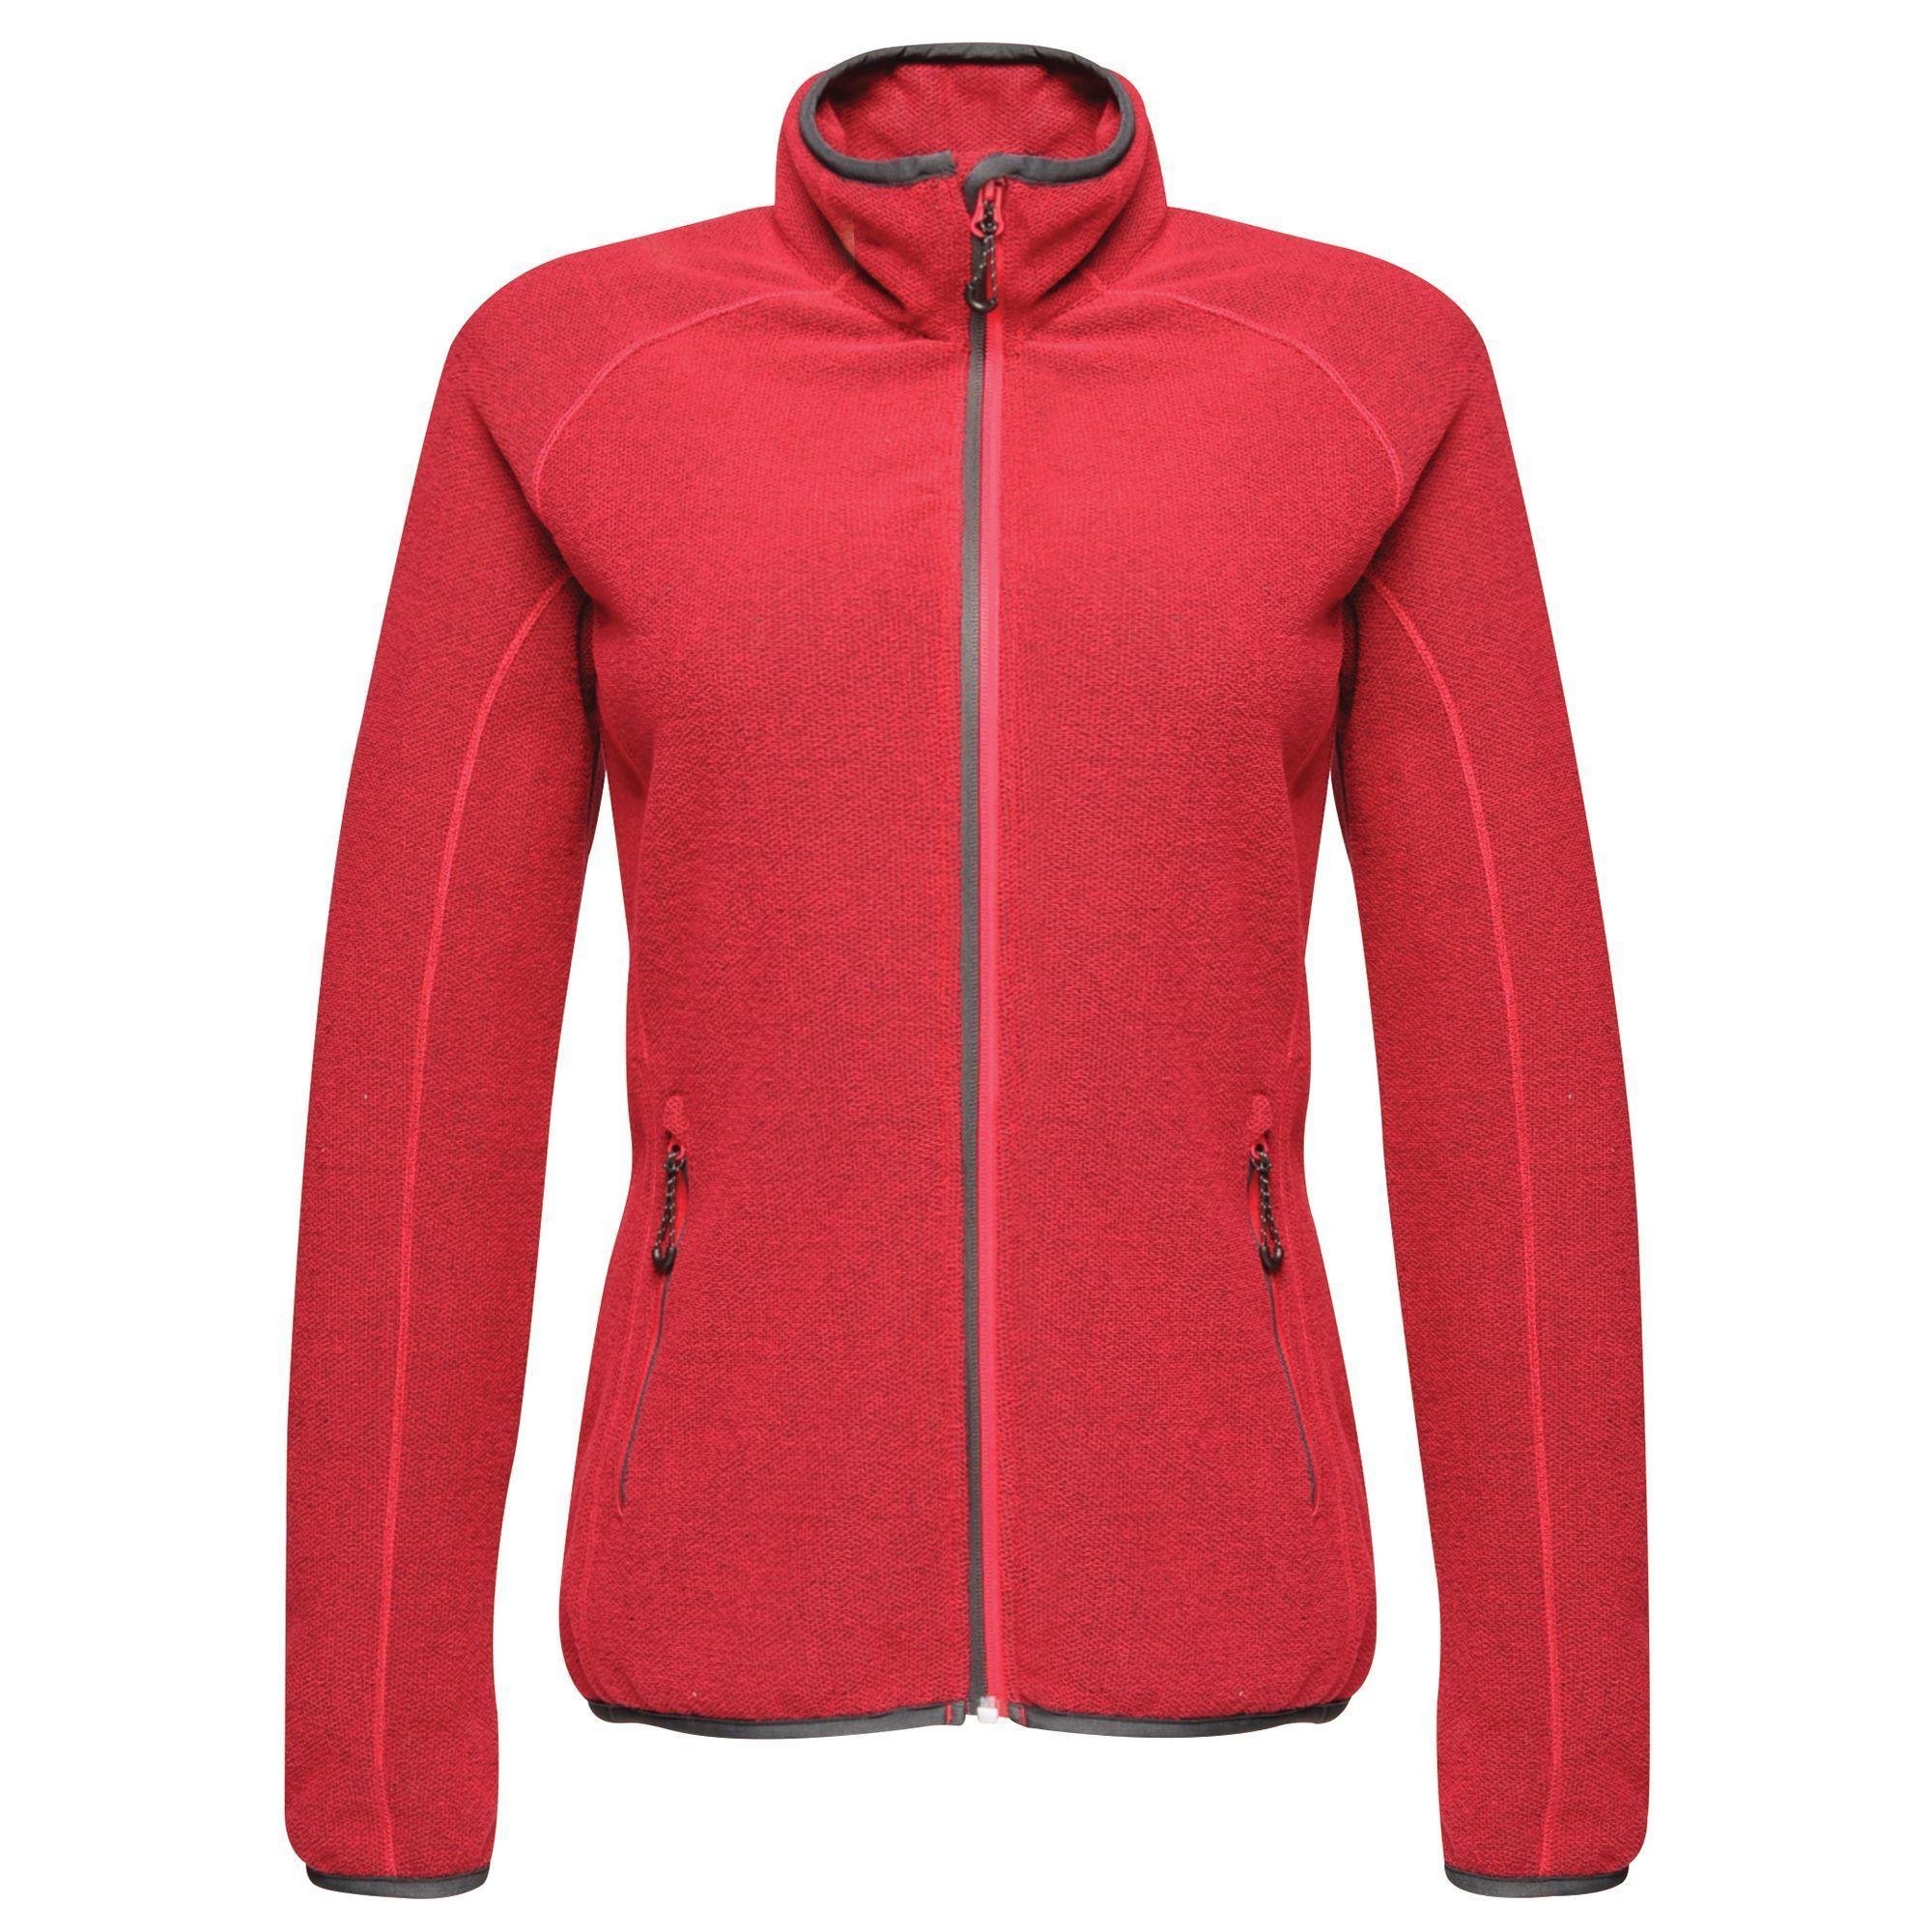 Regatta Womens/Ladies Dreamste Full Zip Fleece